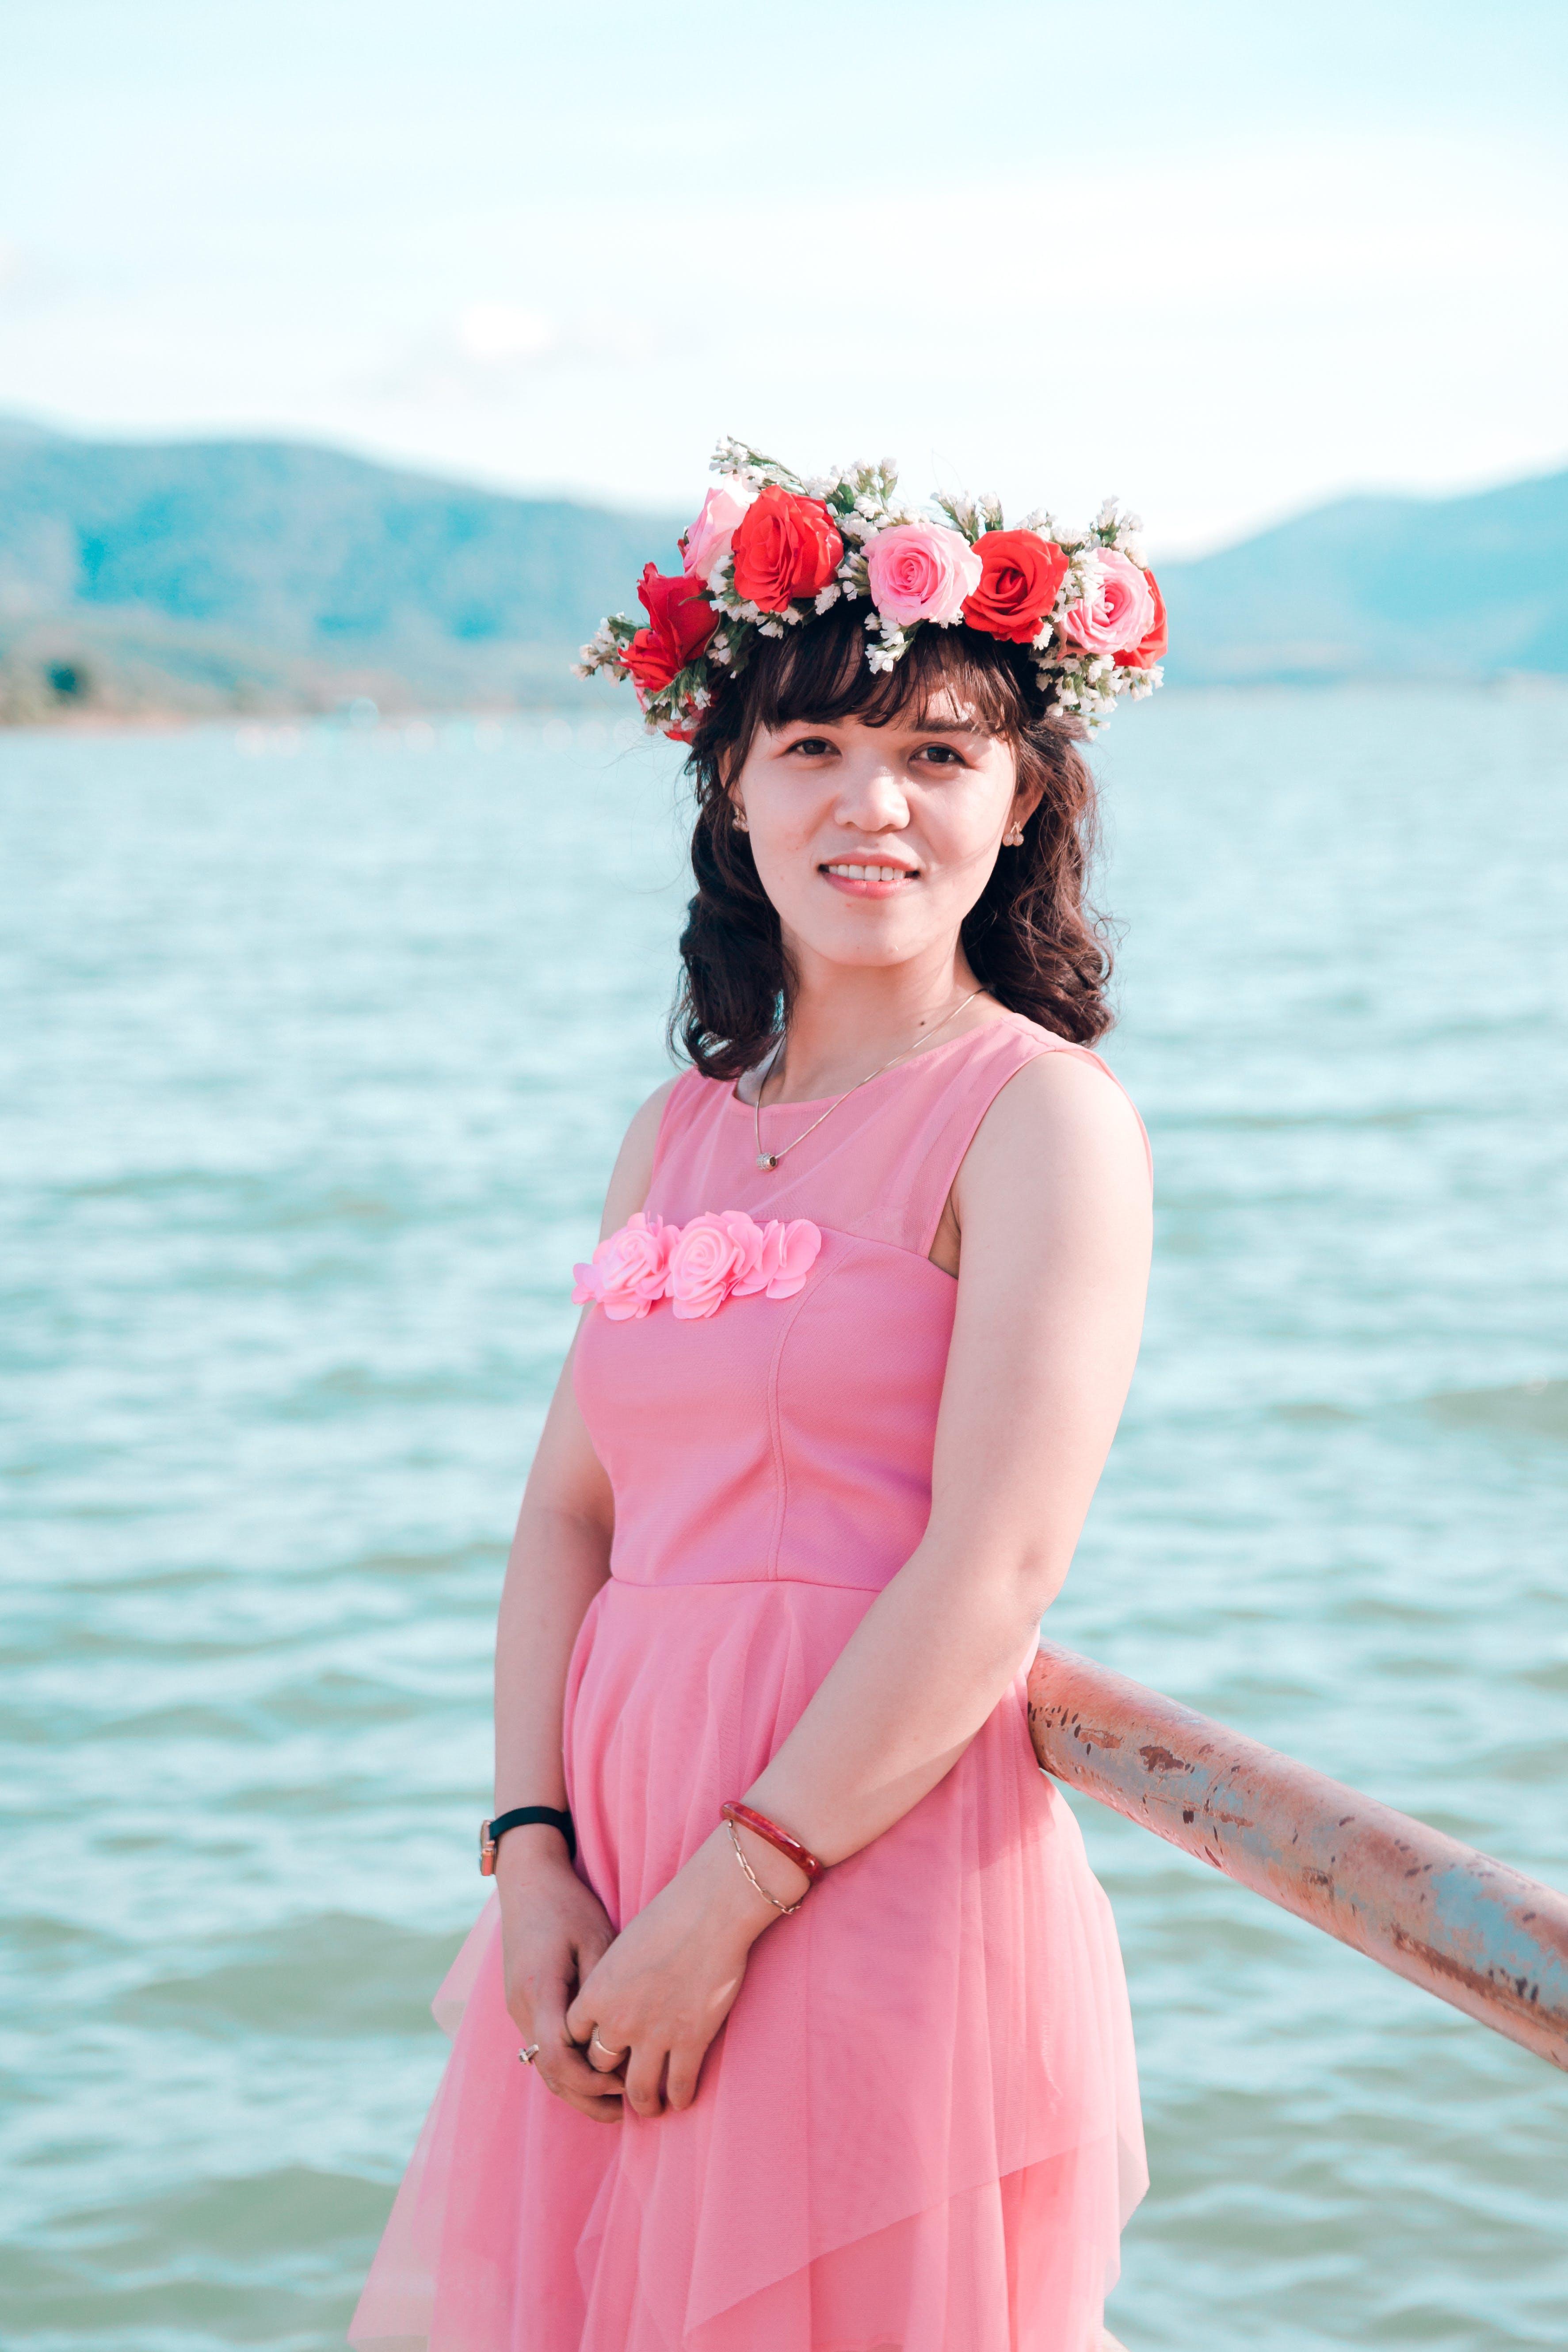 Woman in Pink Dress and Wearing Headdress Near Body of Water